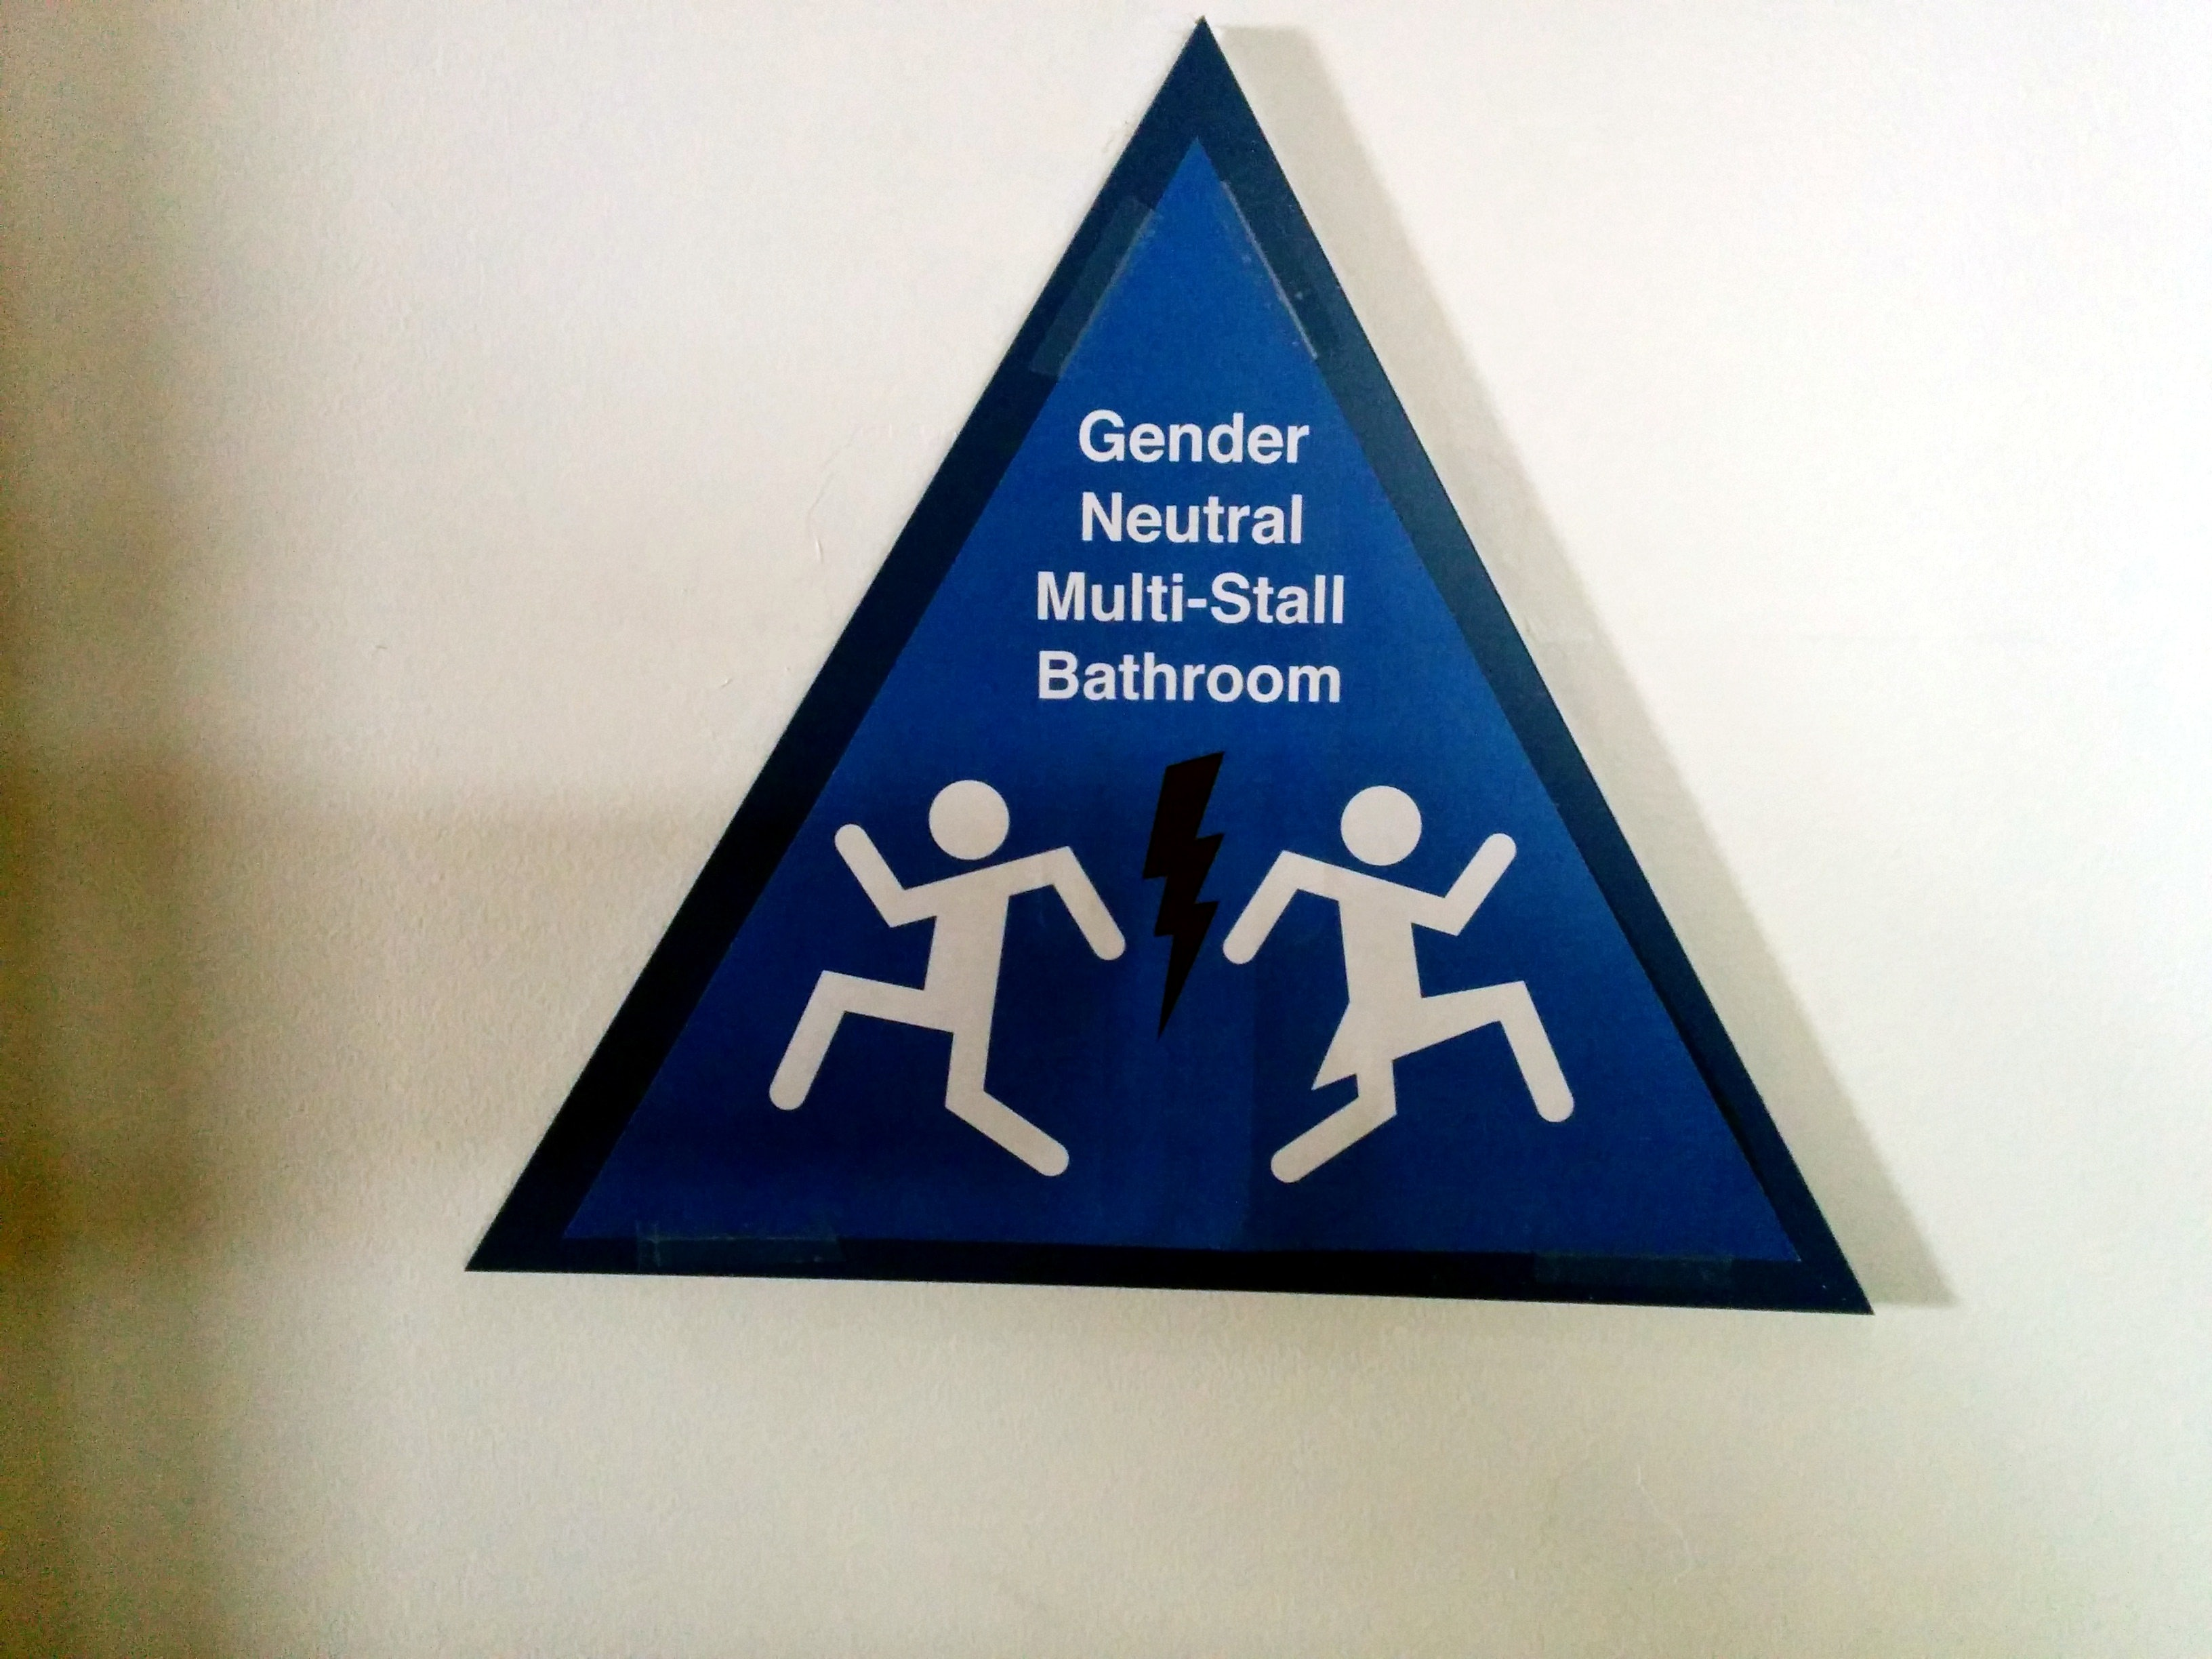 harvard divinity school installs gender-neutral bathrooms, becomes